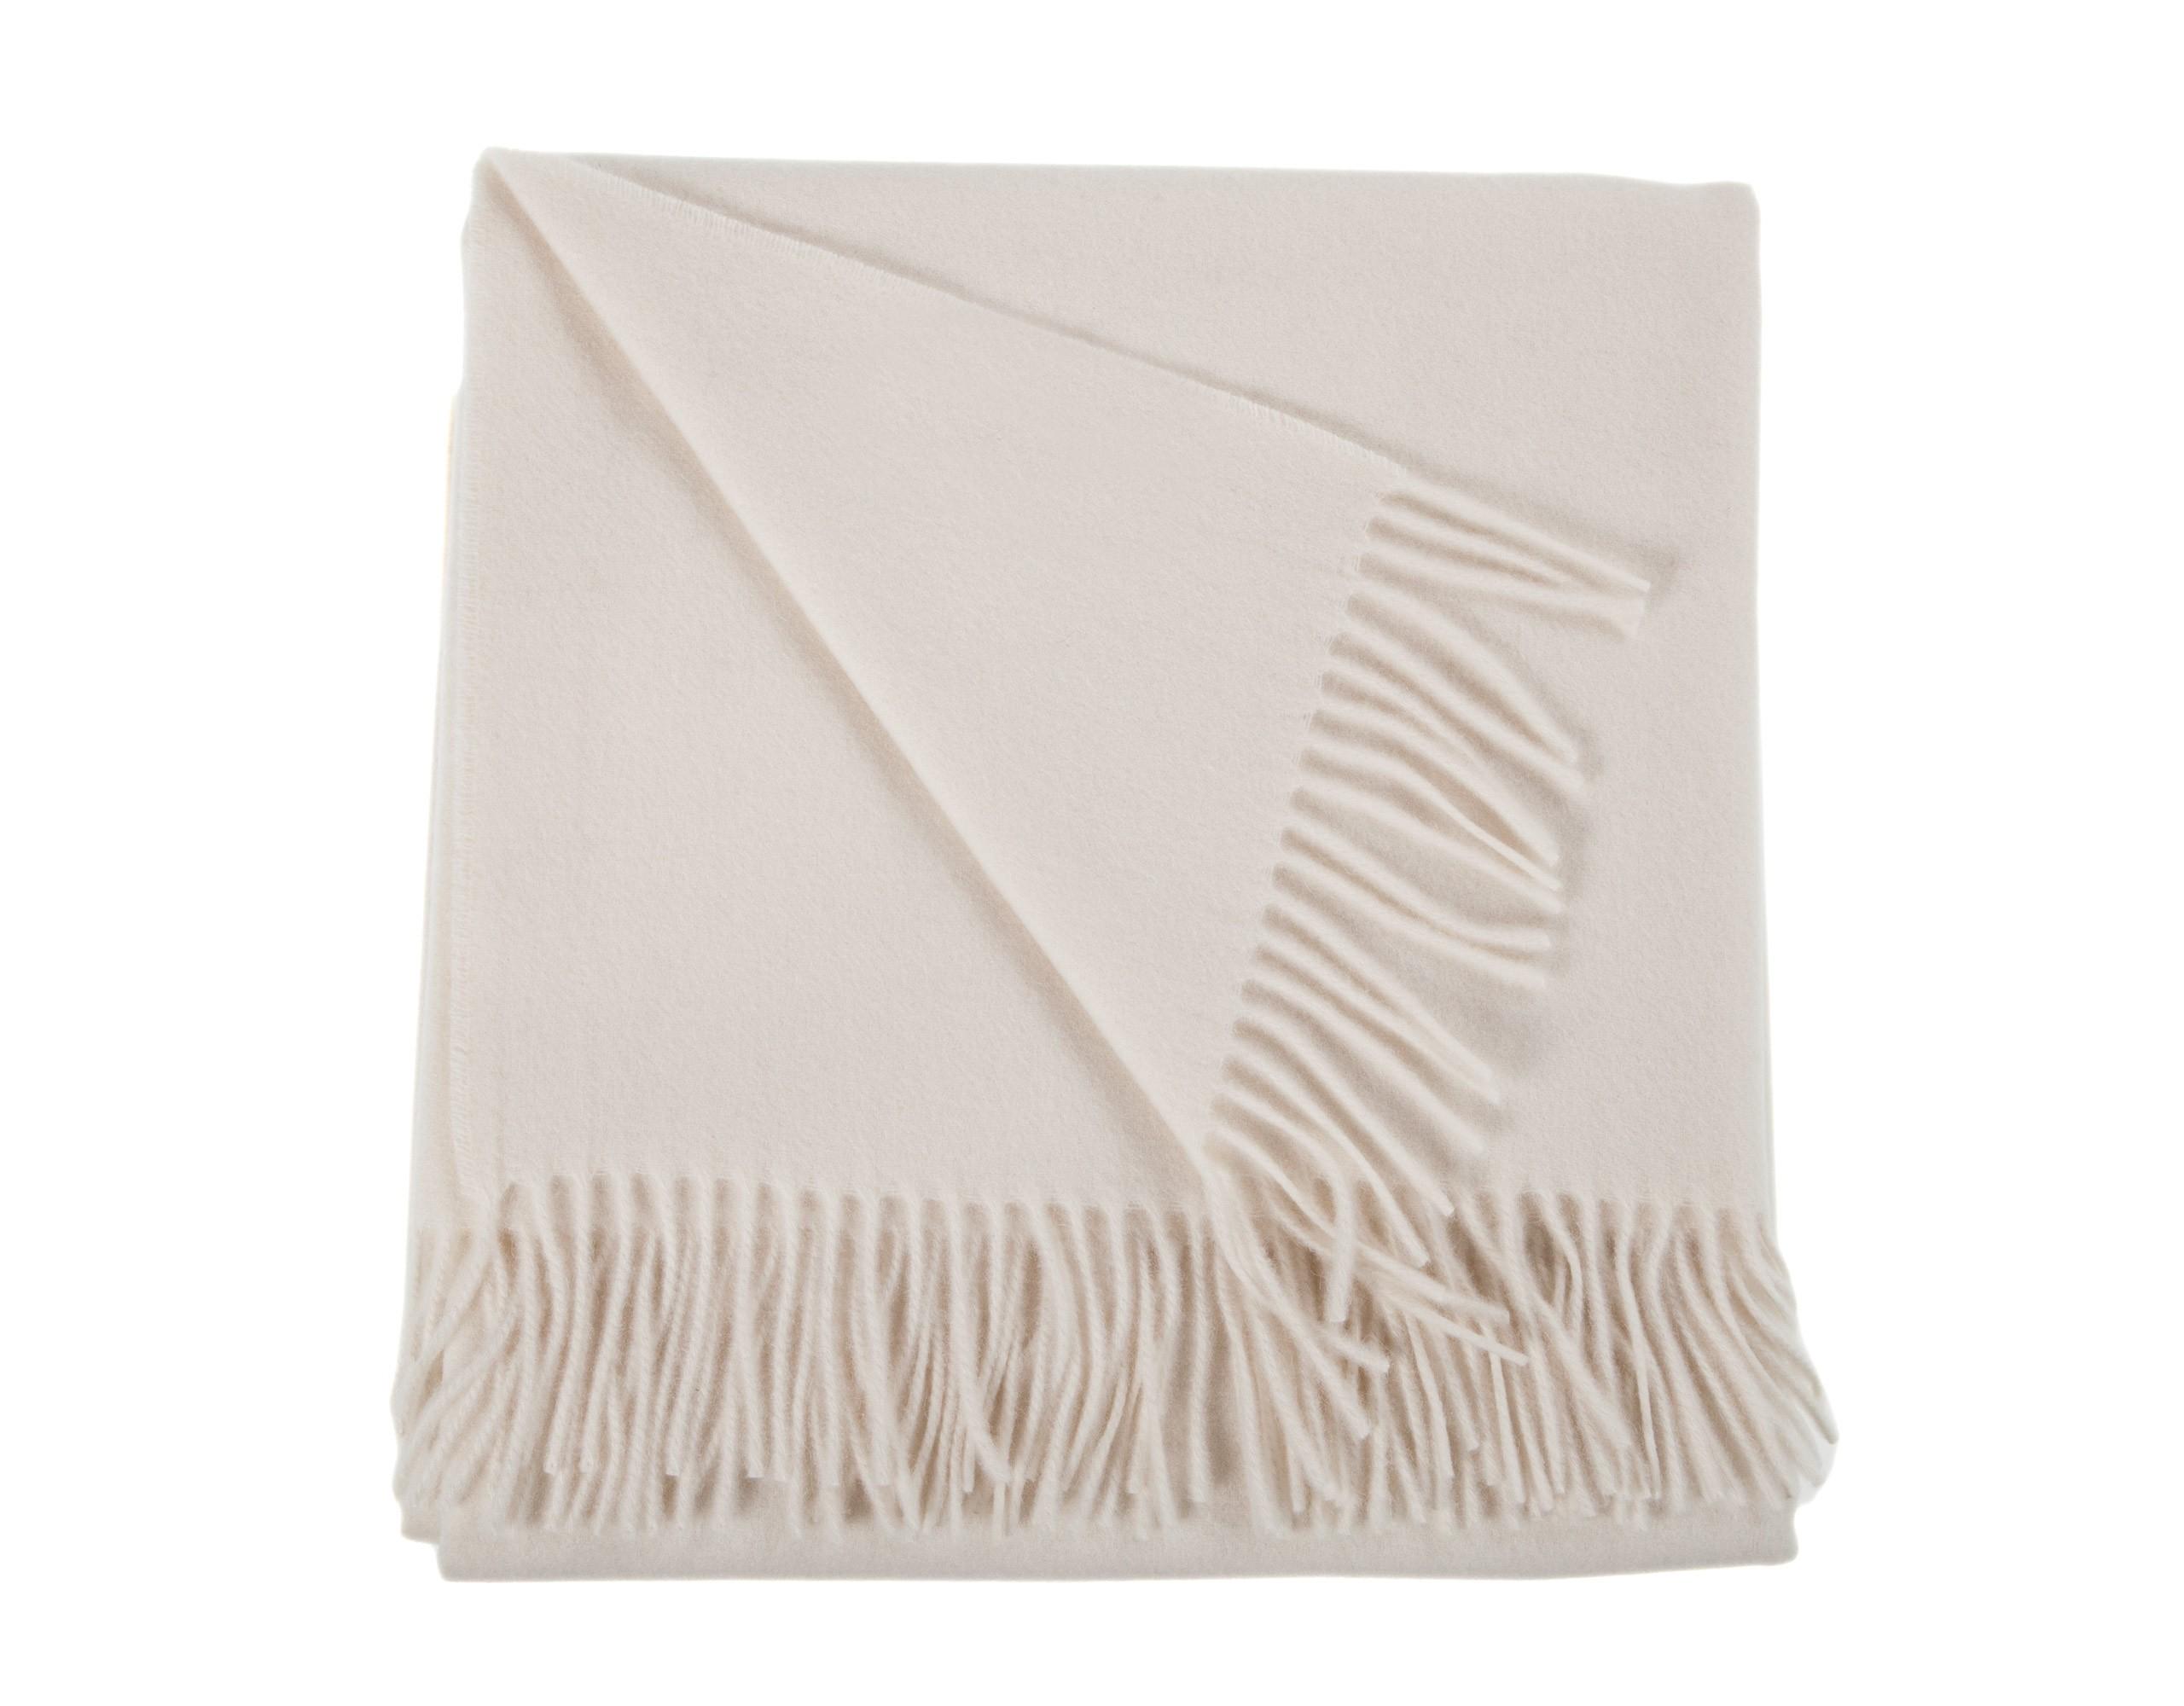 everest cashmere throw - natural cream ctqrthm